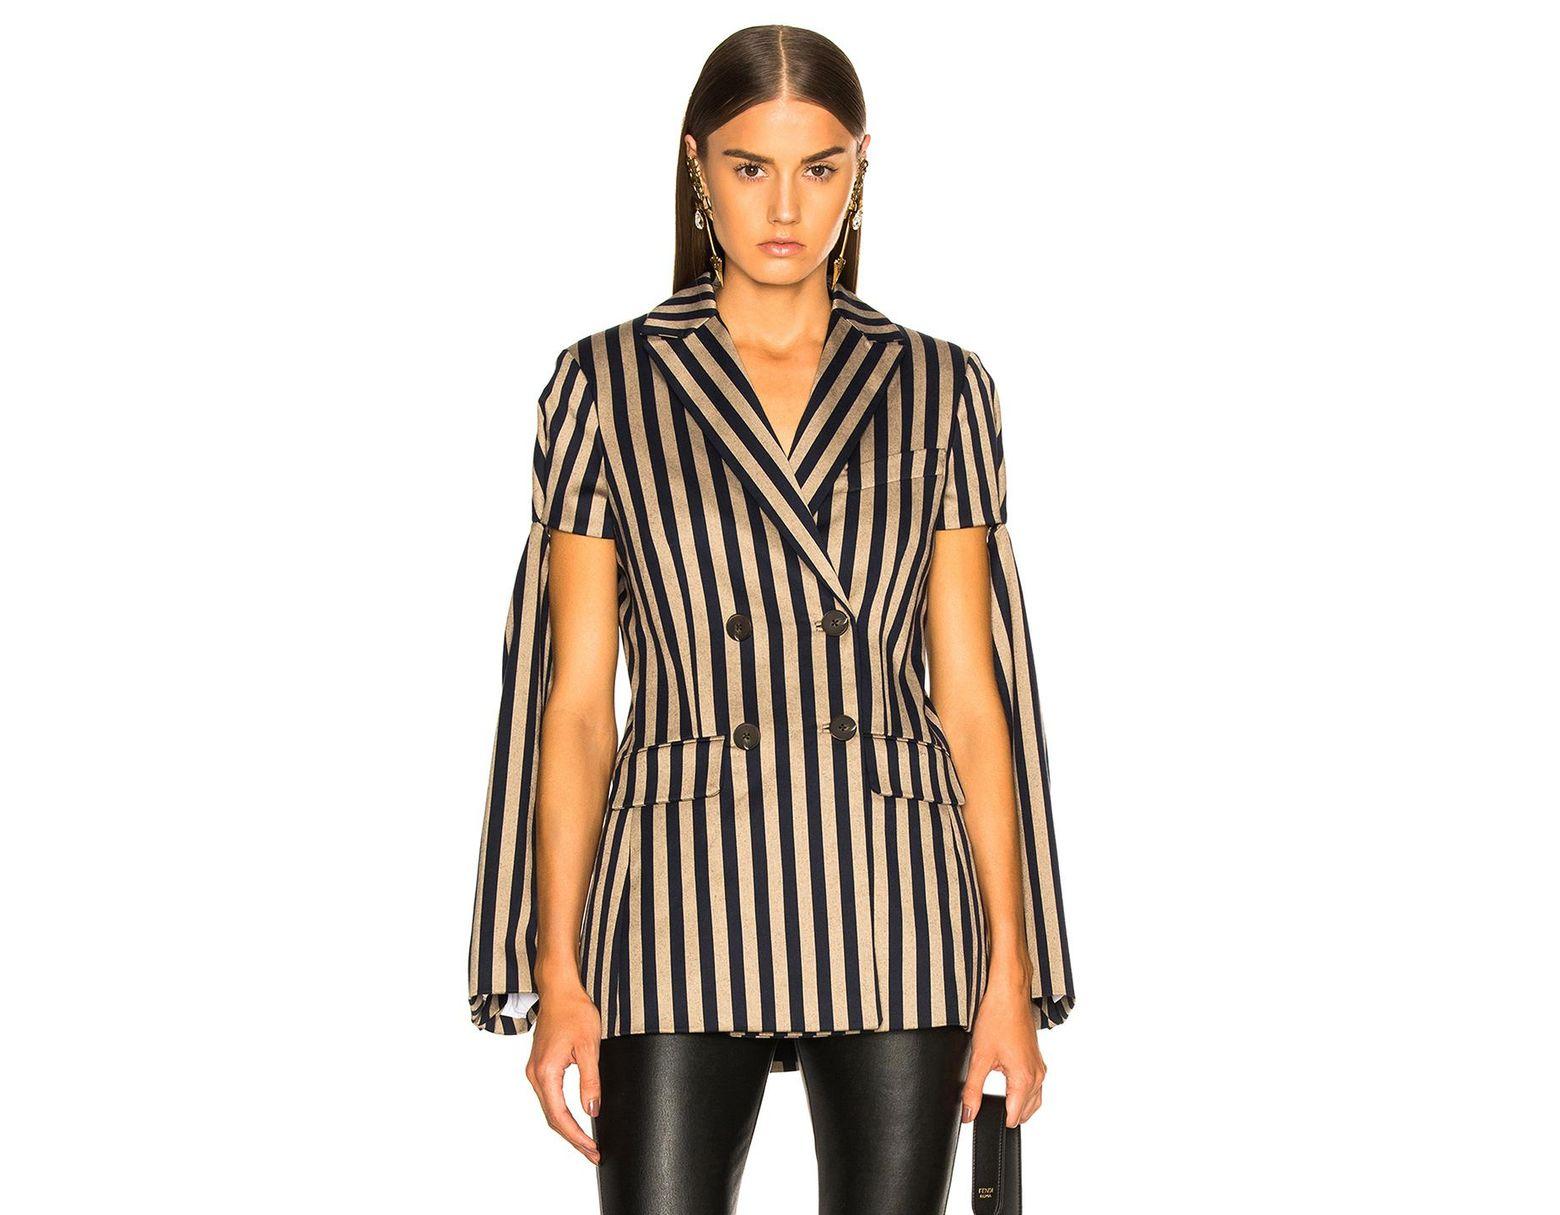 4a34fae4779 Lyst - Jonathan Simkhai Stripe Double Breasted Jacket in Black